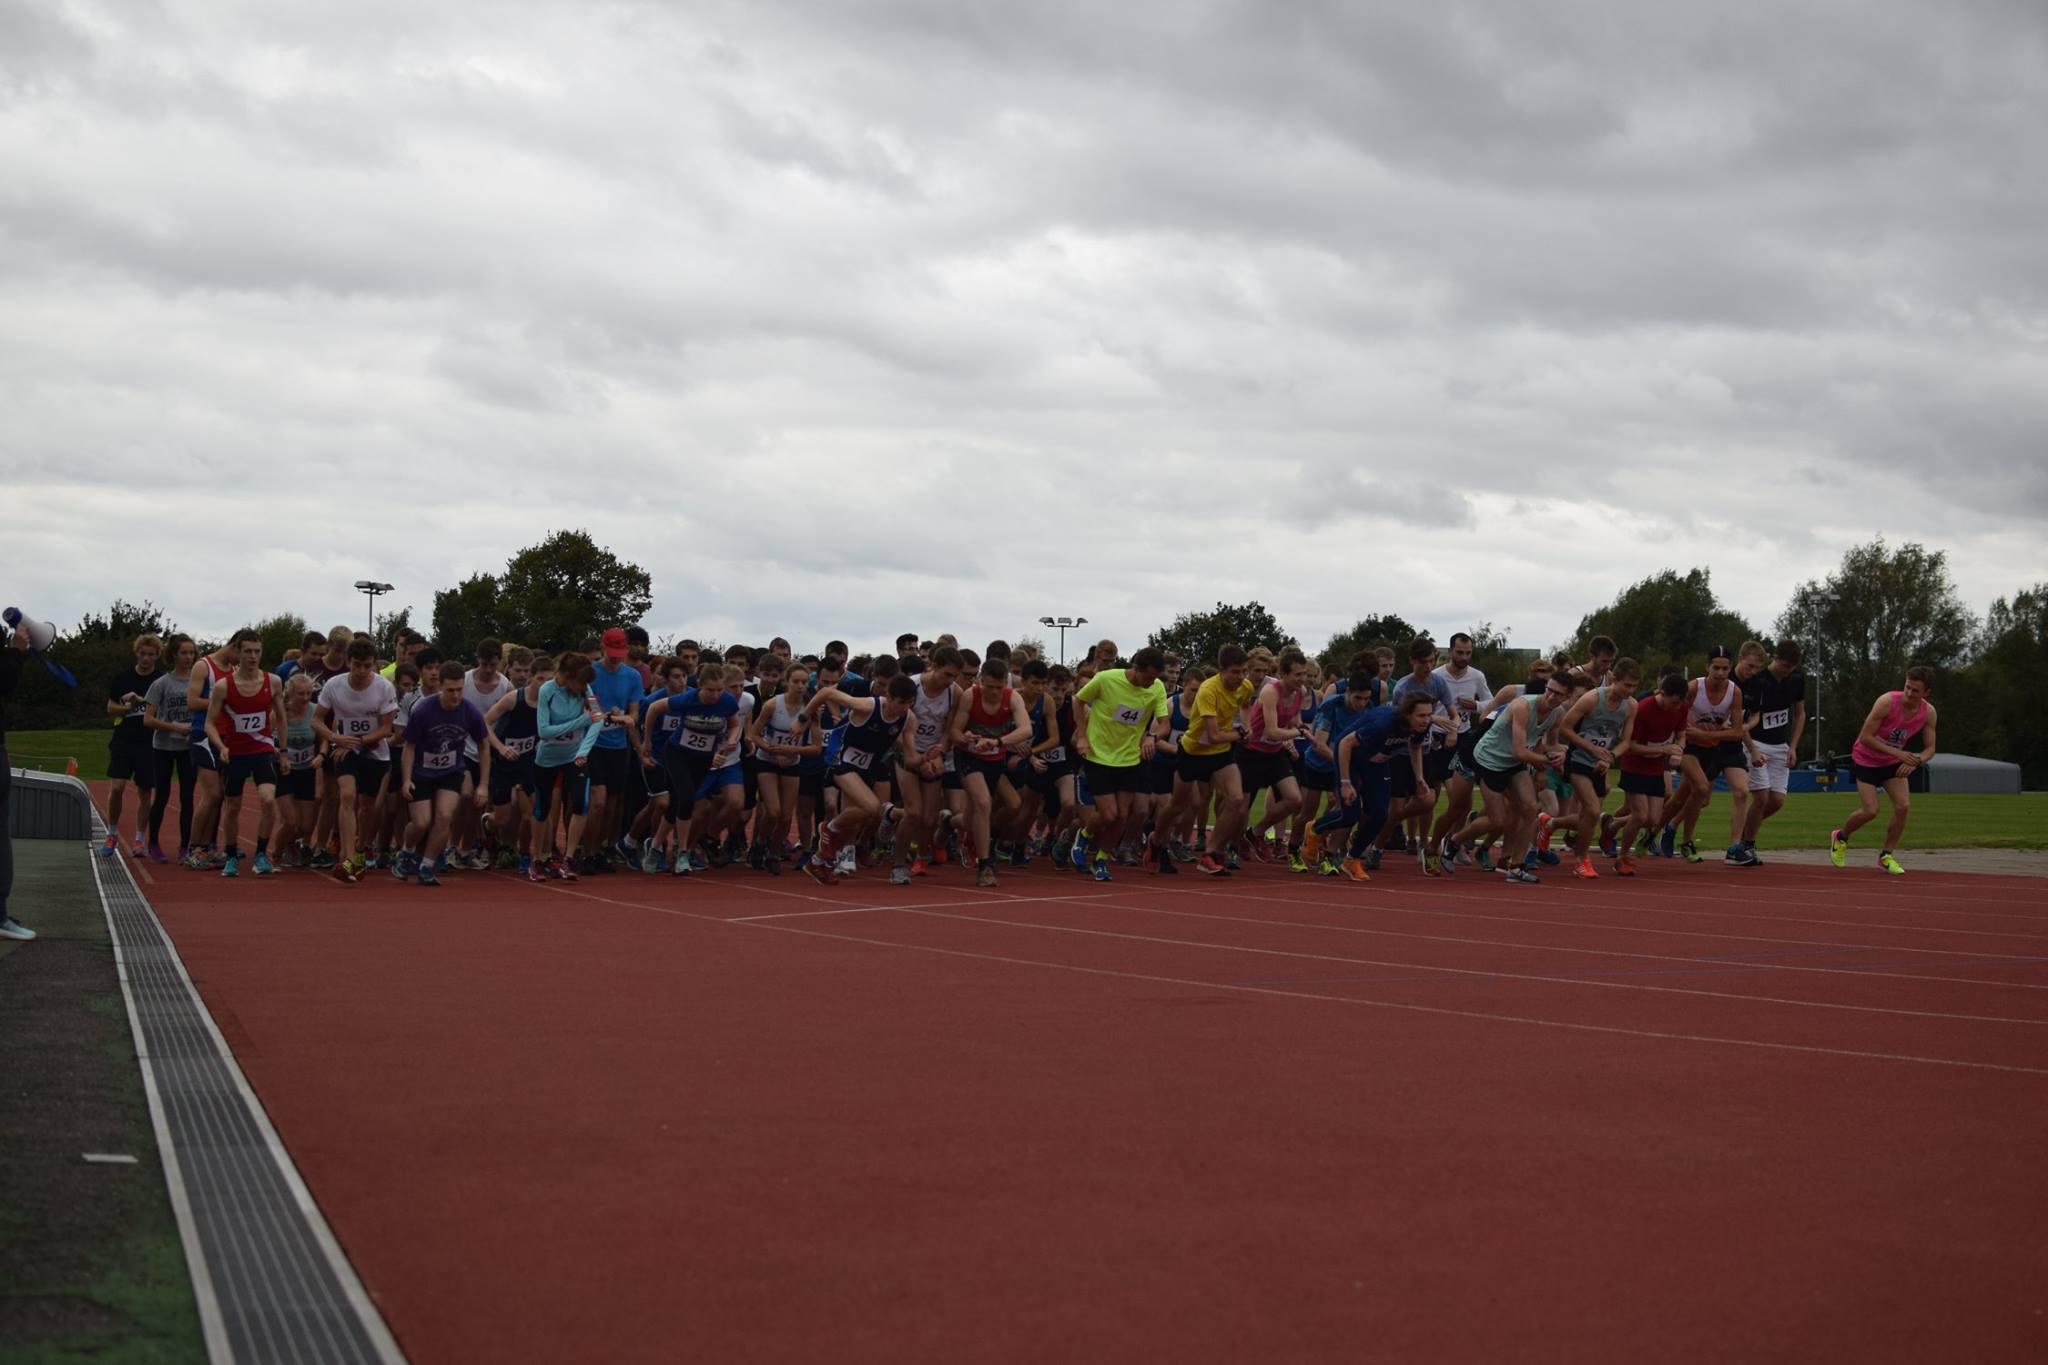 Start of the 2017 Freshers' Fun Run (Credit: James Meiklejohn)